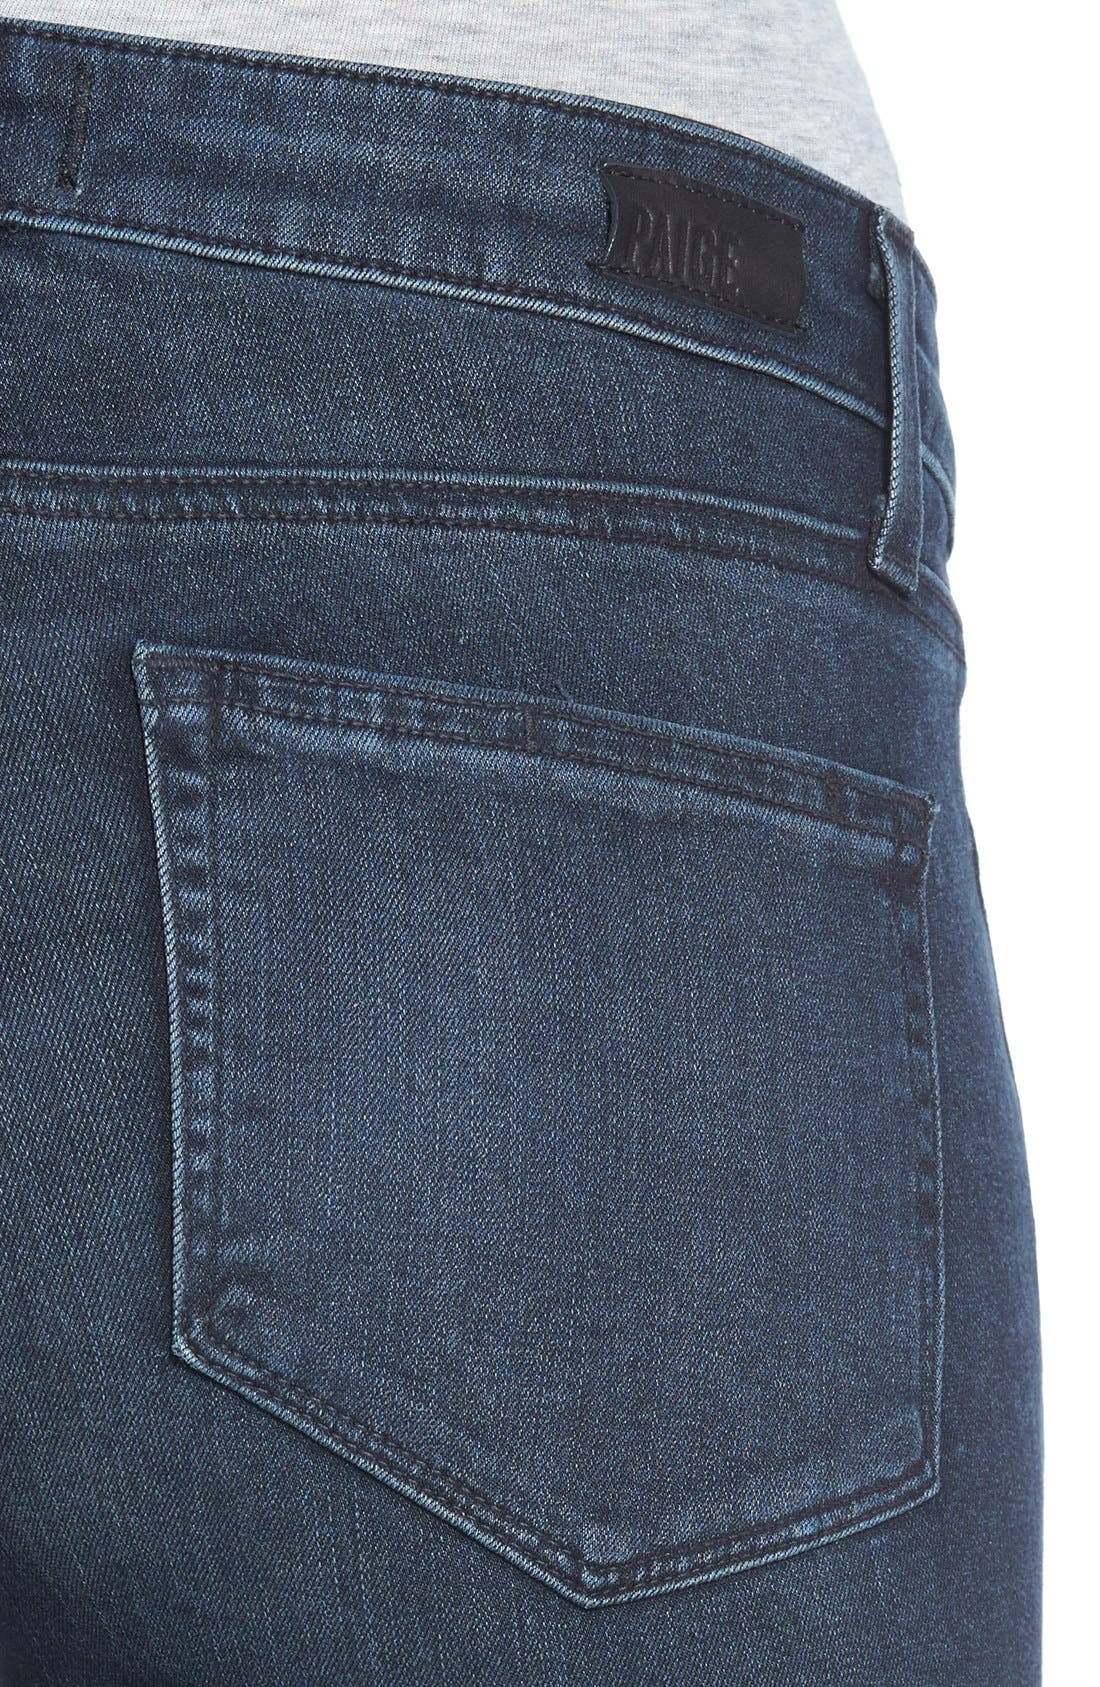 Denim 'Jill' Ultra Skinny Jeans,                             Alternate thumbnail 5, color,                             400